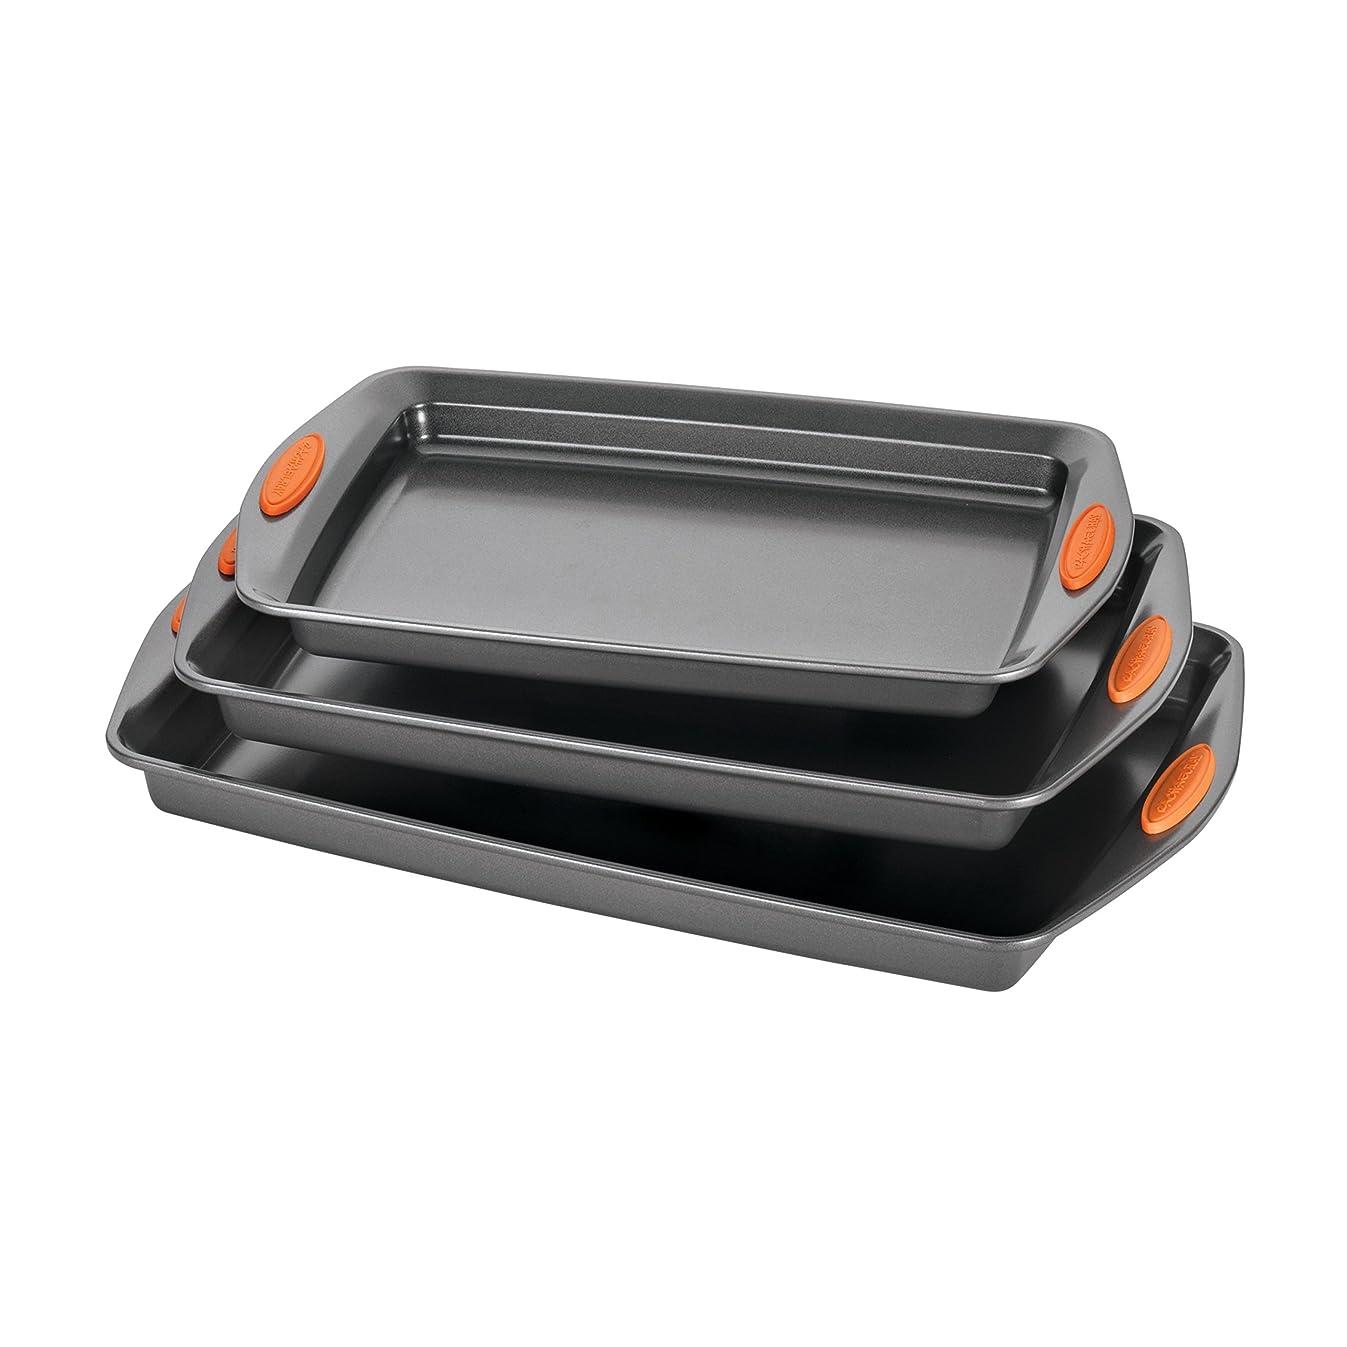 Rachael Ray 56524 3-Piece Oven Lovin' Cookie Pan Steel Baking Sheet Set, Gray with Orange Grips